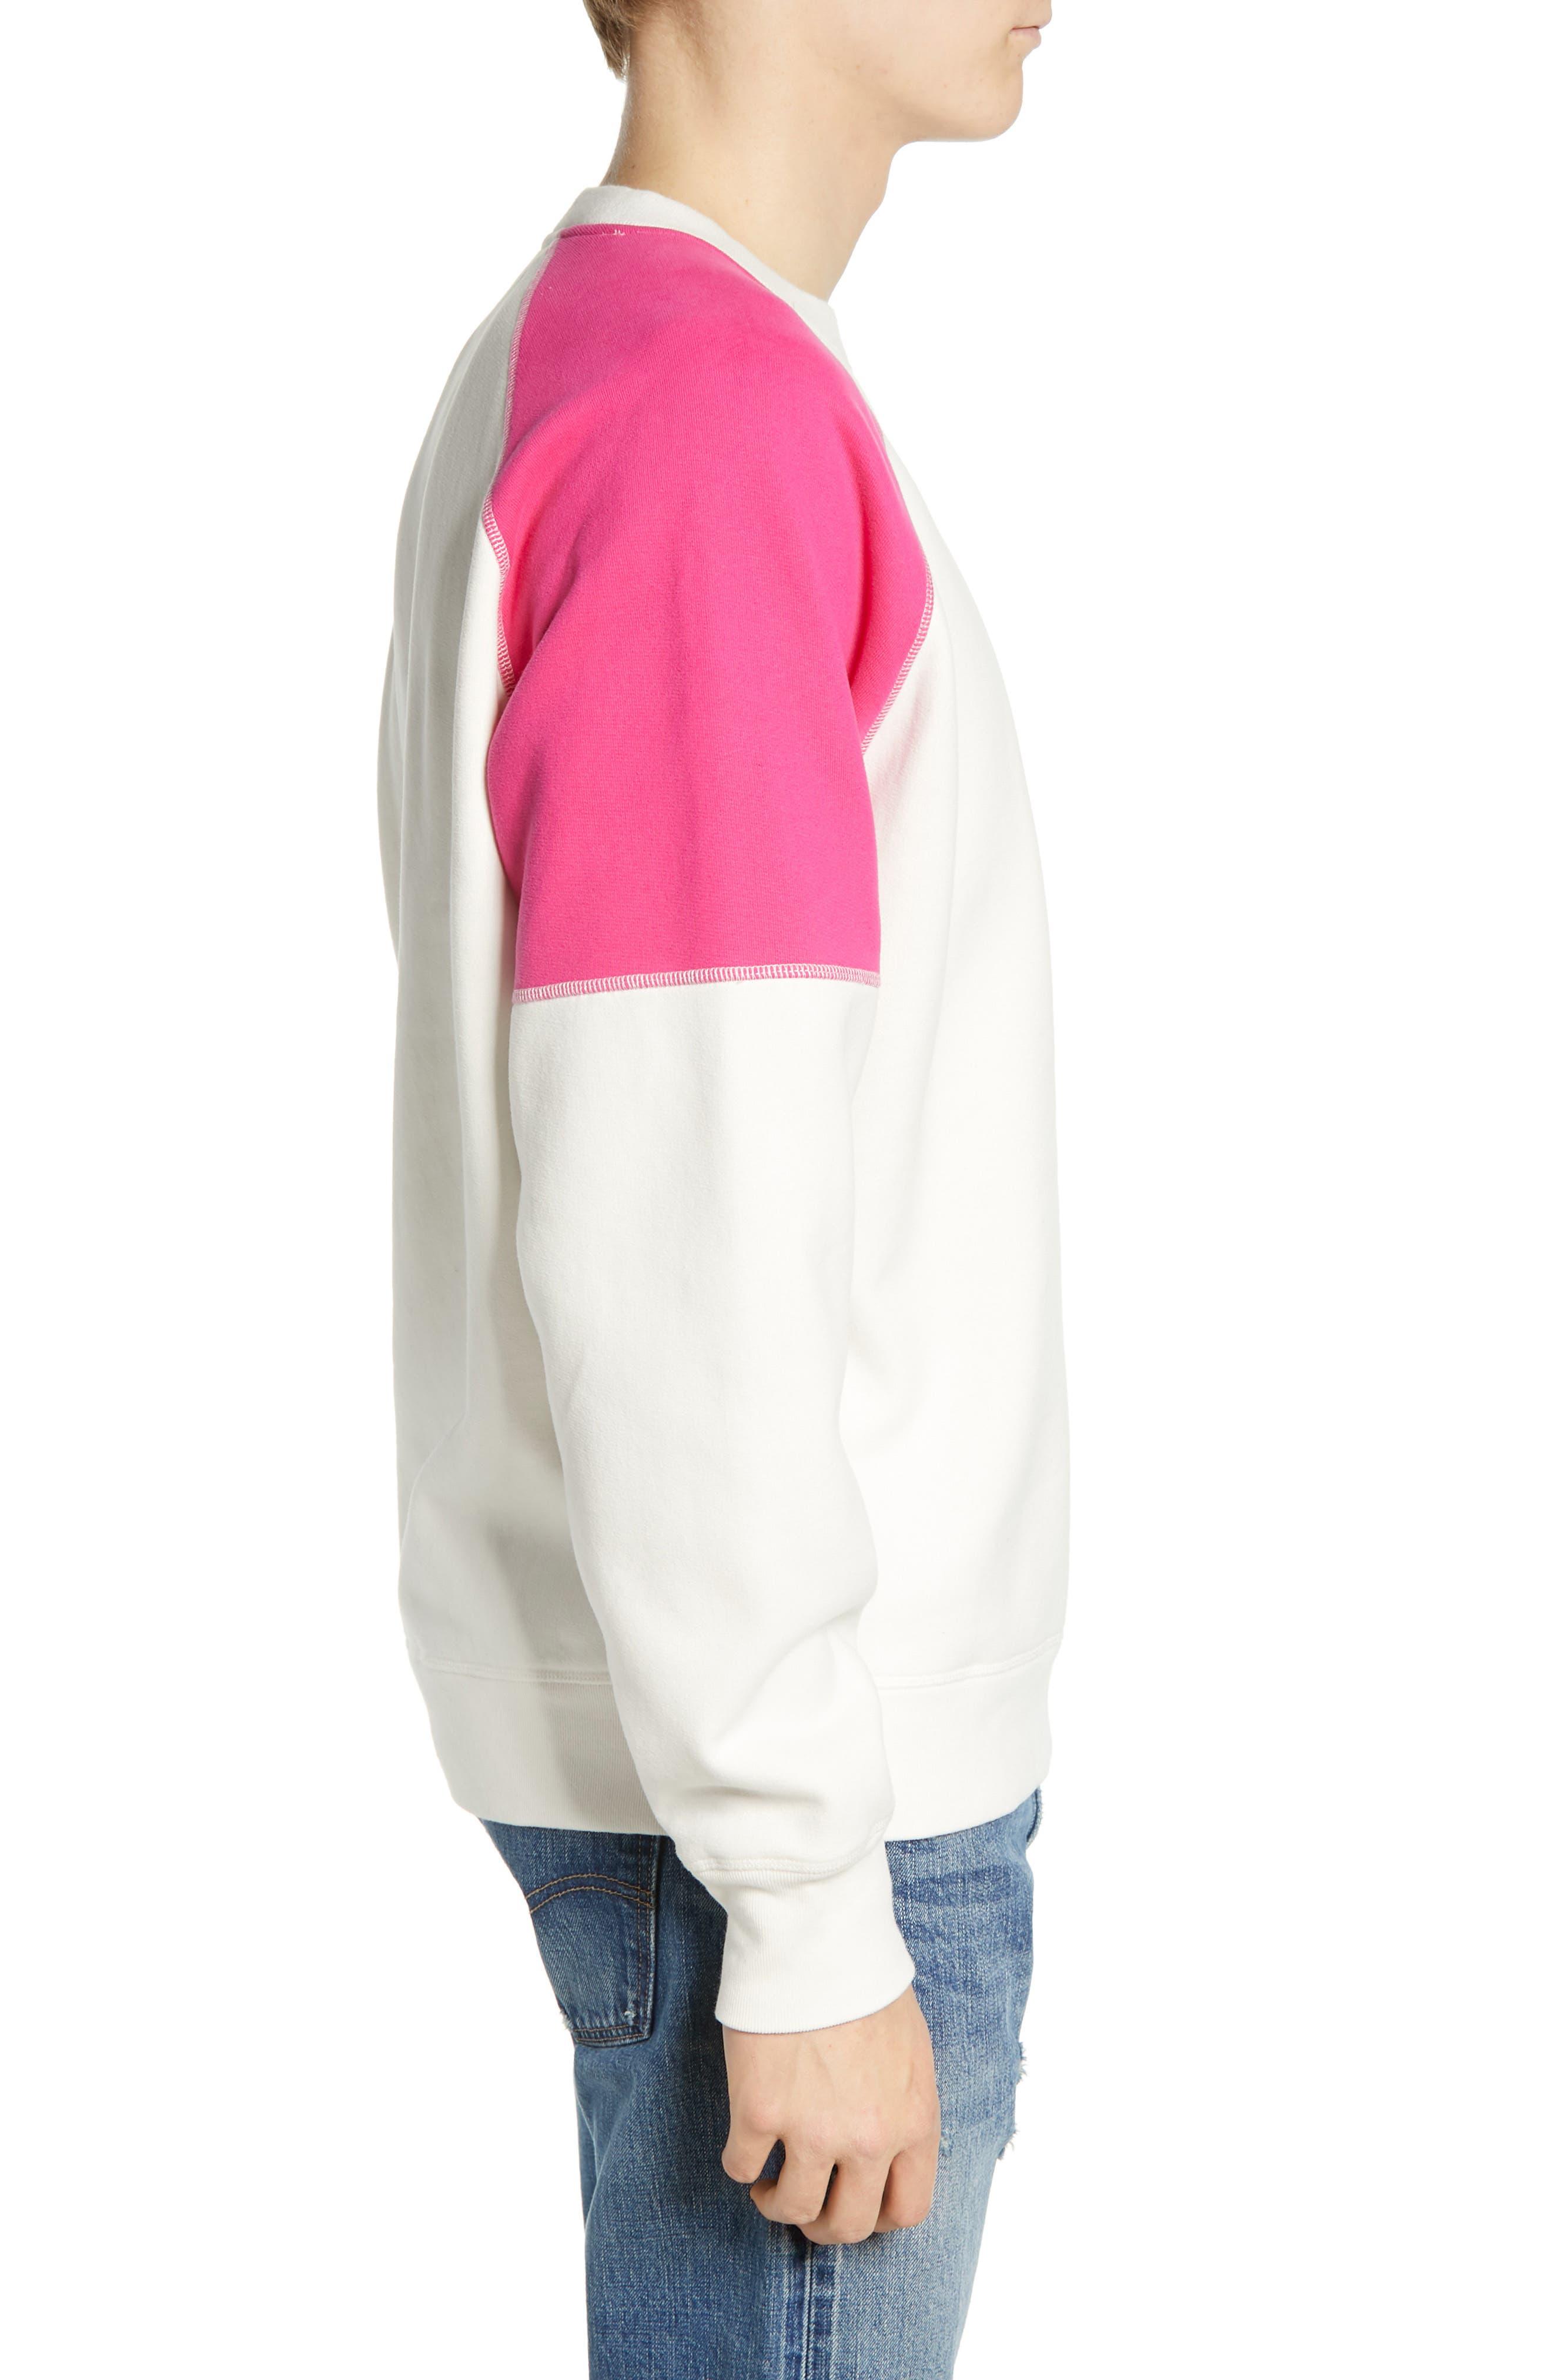 LEVI'S<SUP>®</SUP> MADE & CRAFTED<SUP>™</SUP>, Regular Fit Raglan Sweatshirt, Alternate thumbnail 3, color, WHITE ALYSSUM